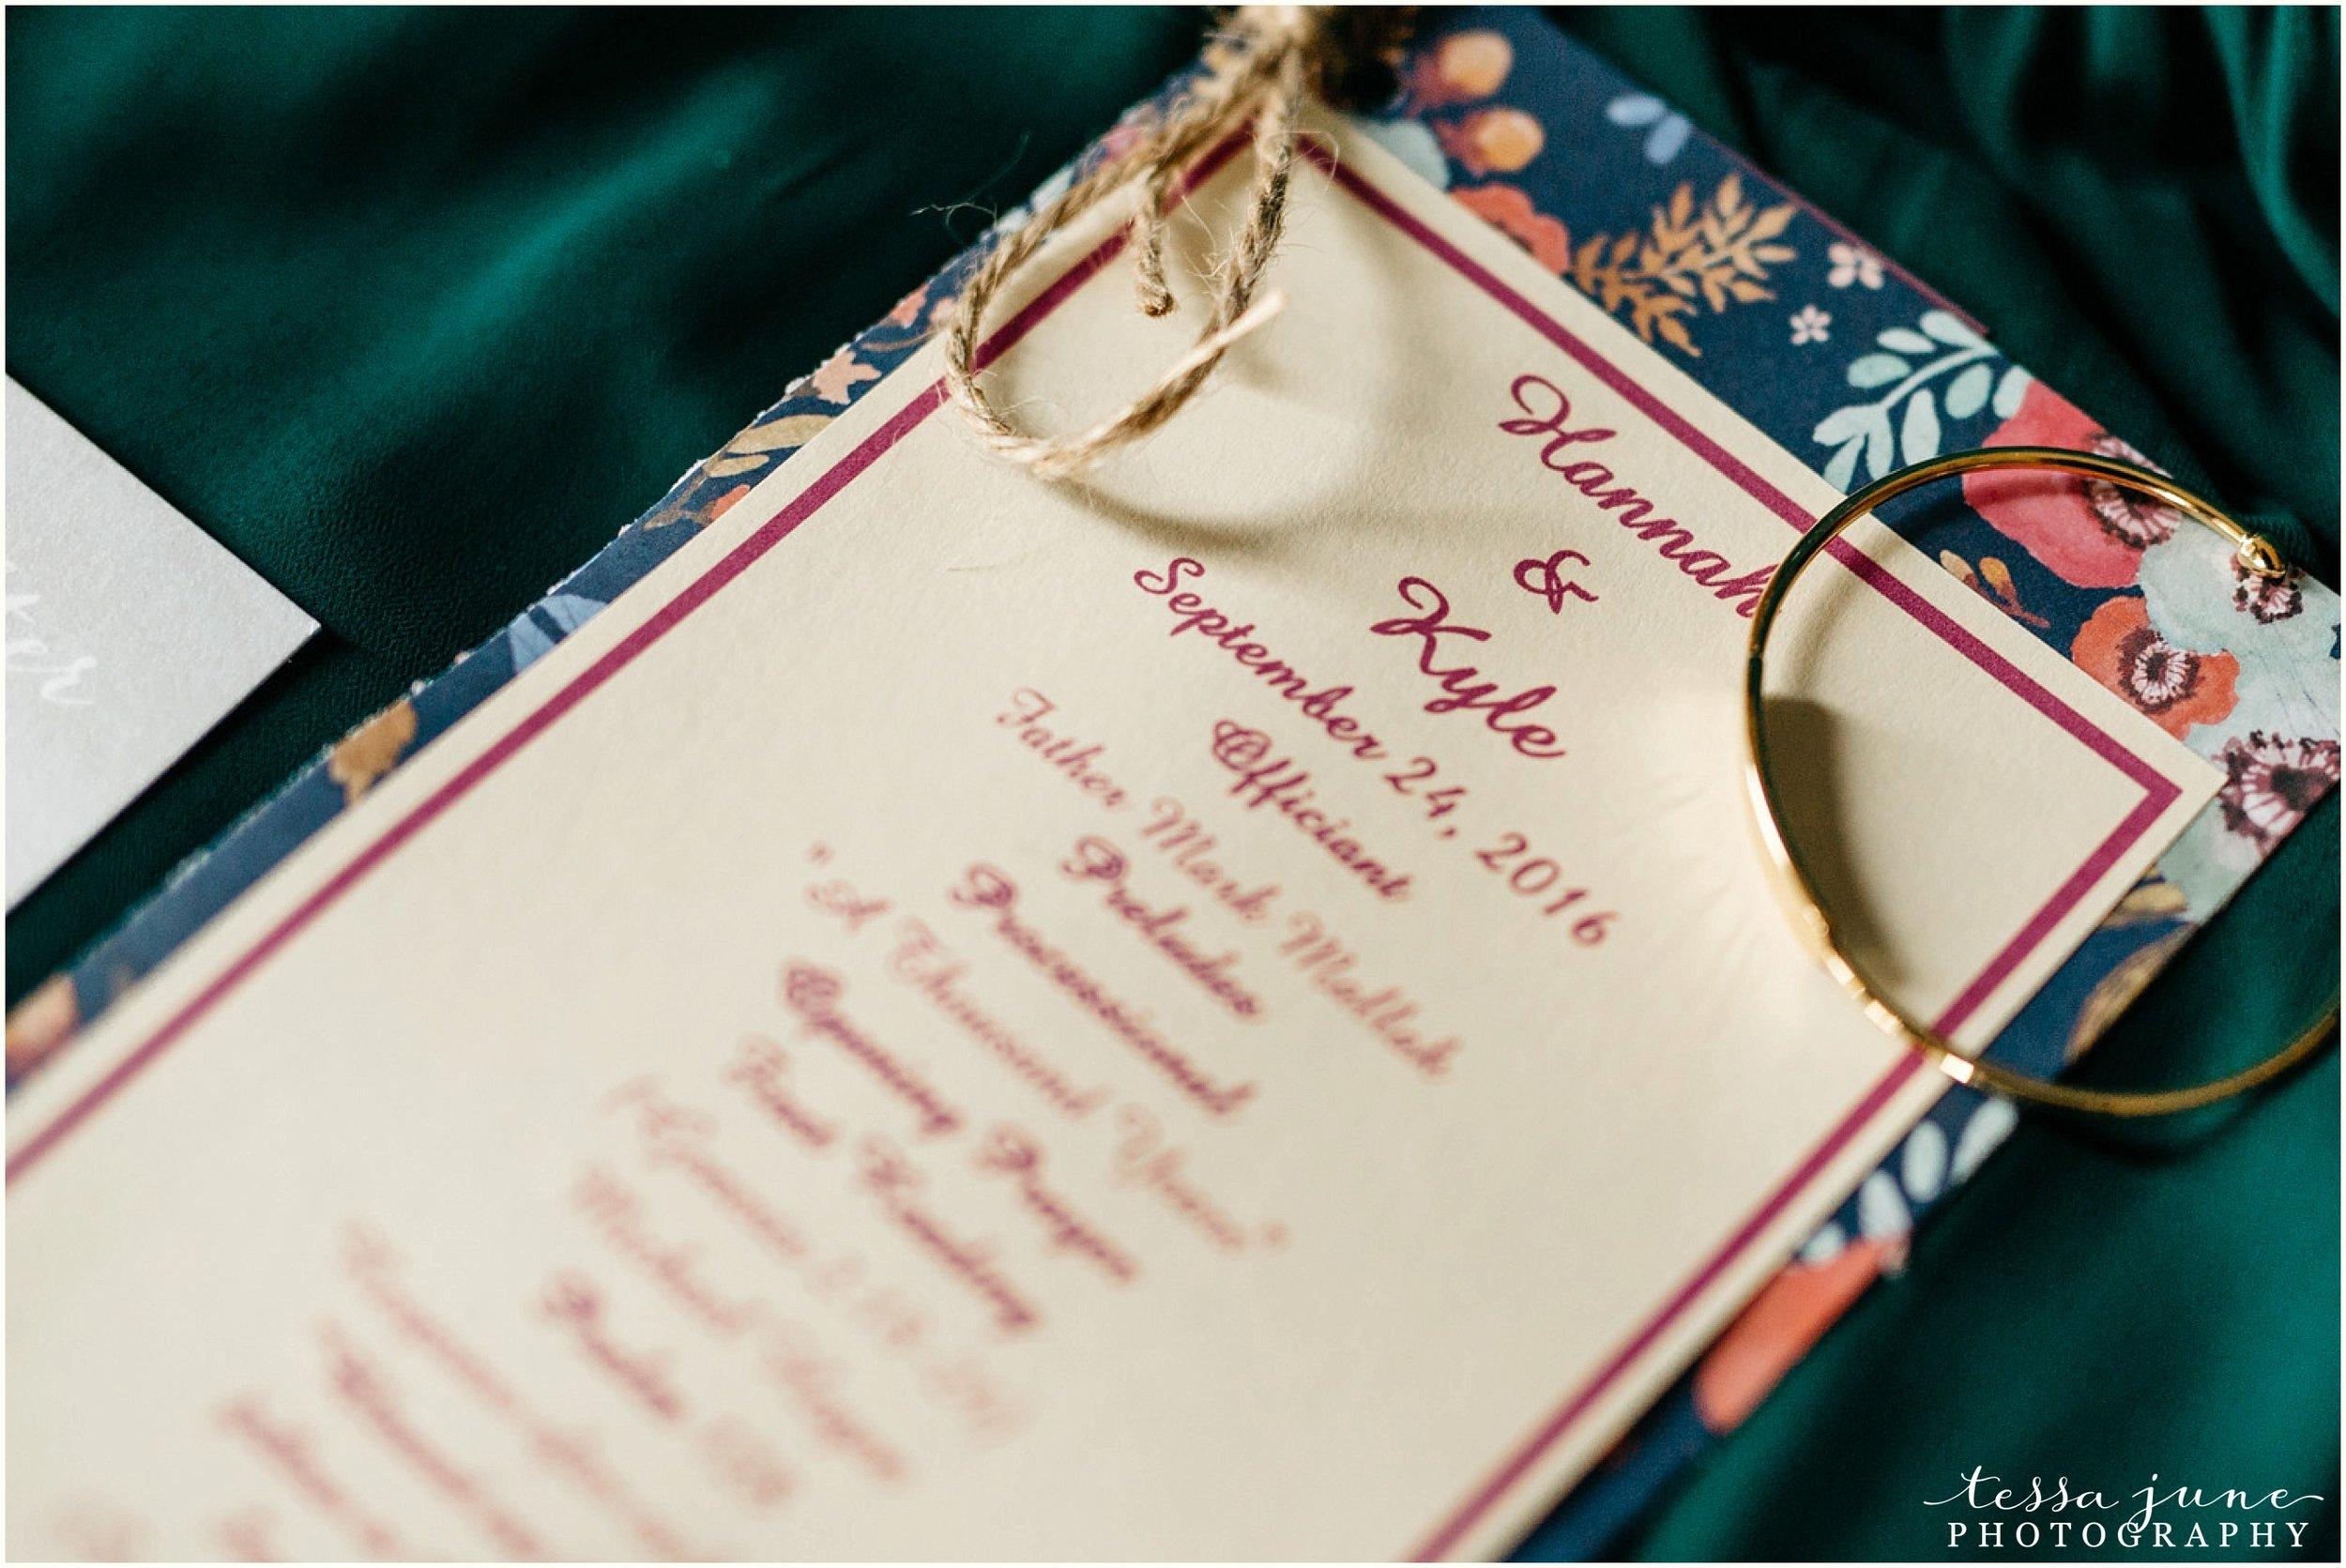 bohemian-minnesota-wedding-mismatched-bridesmaid-dresses-waterfall-st-cloud-tessa-june-photography-8.jpg